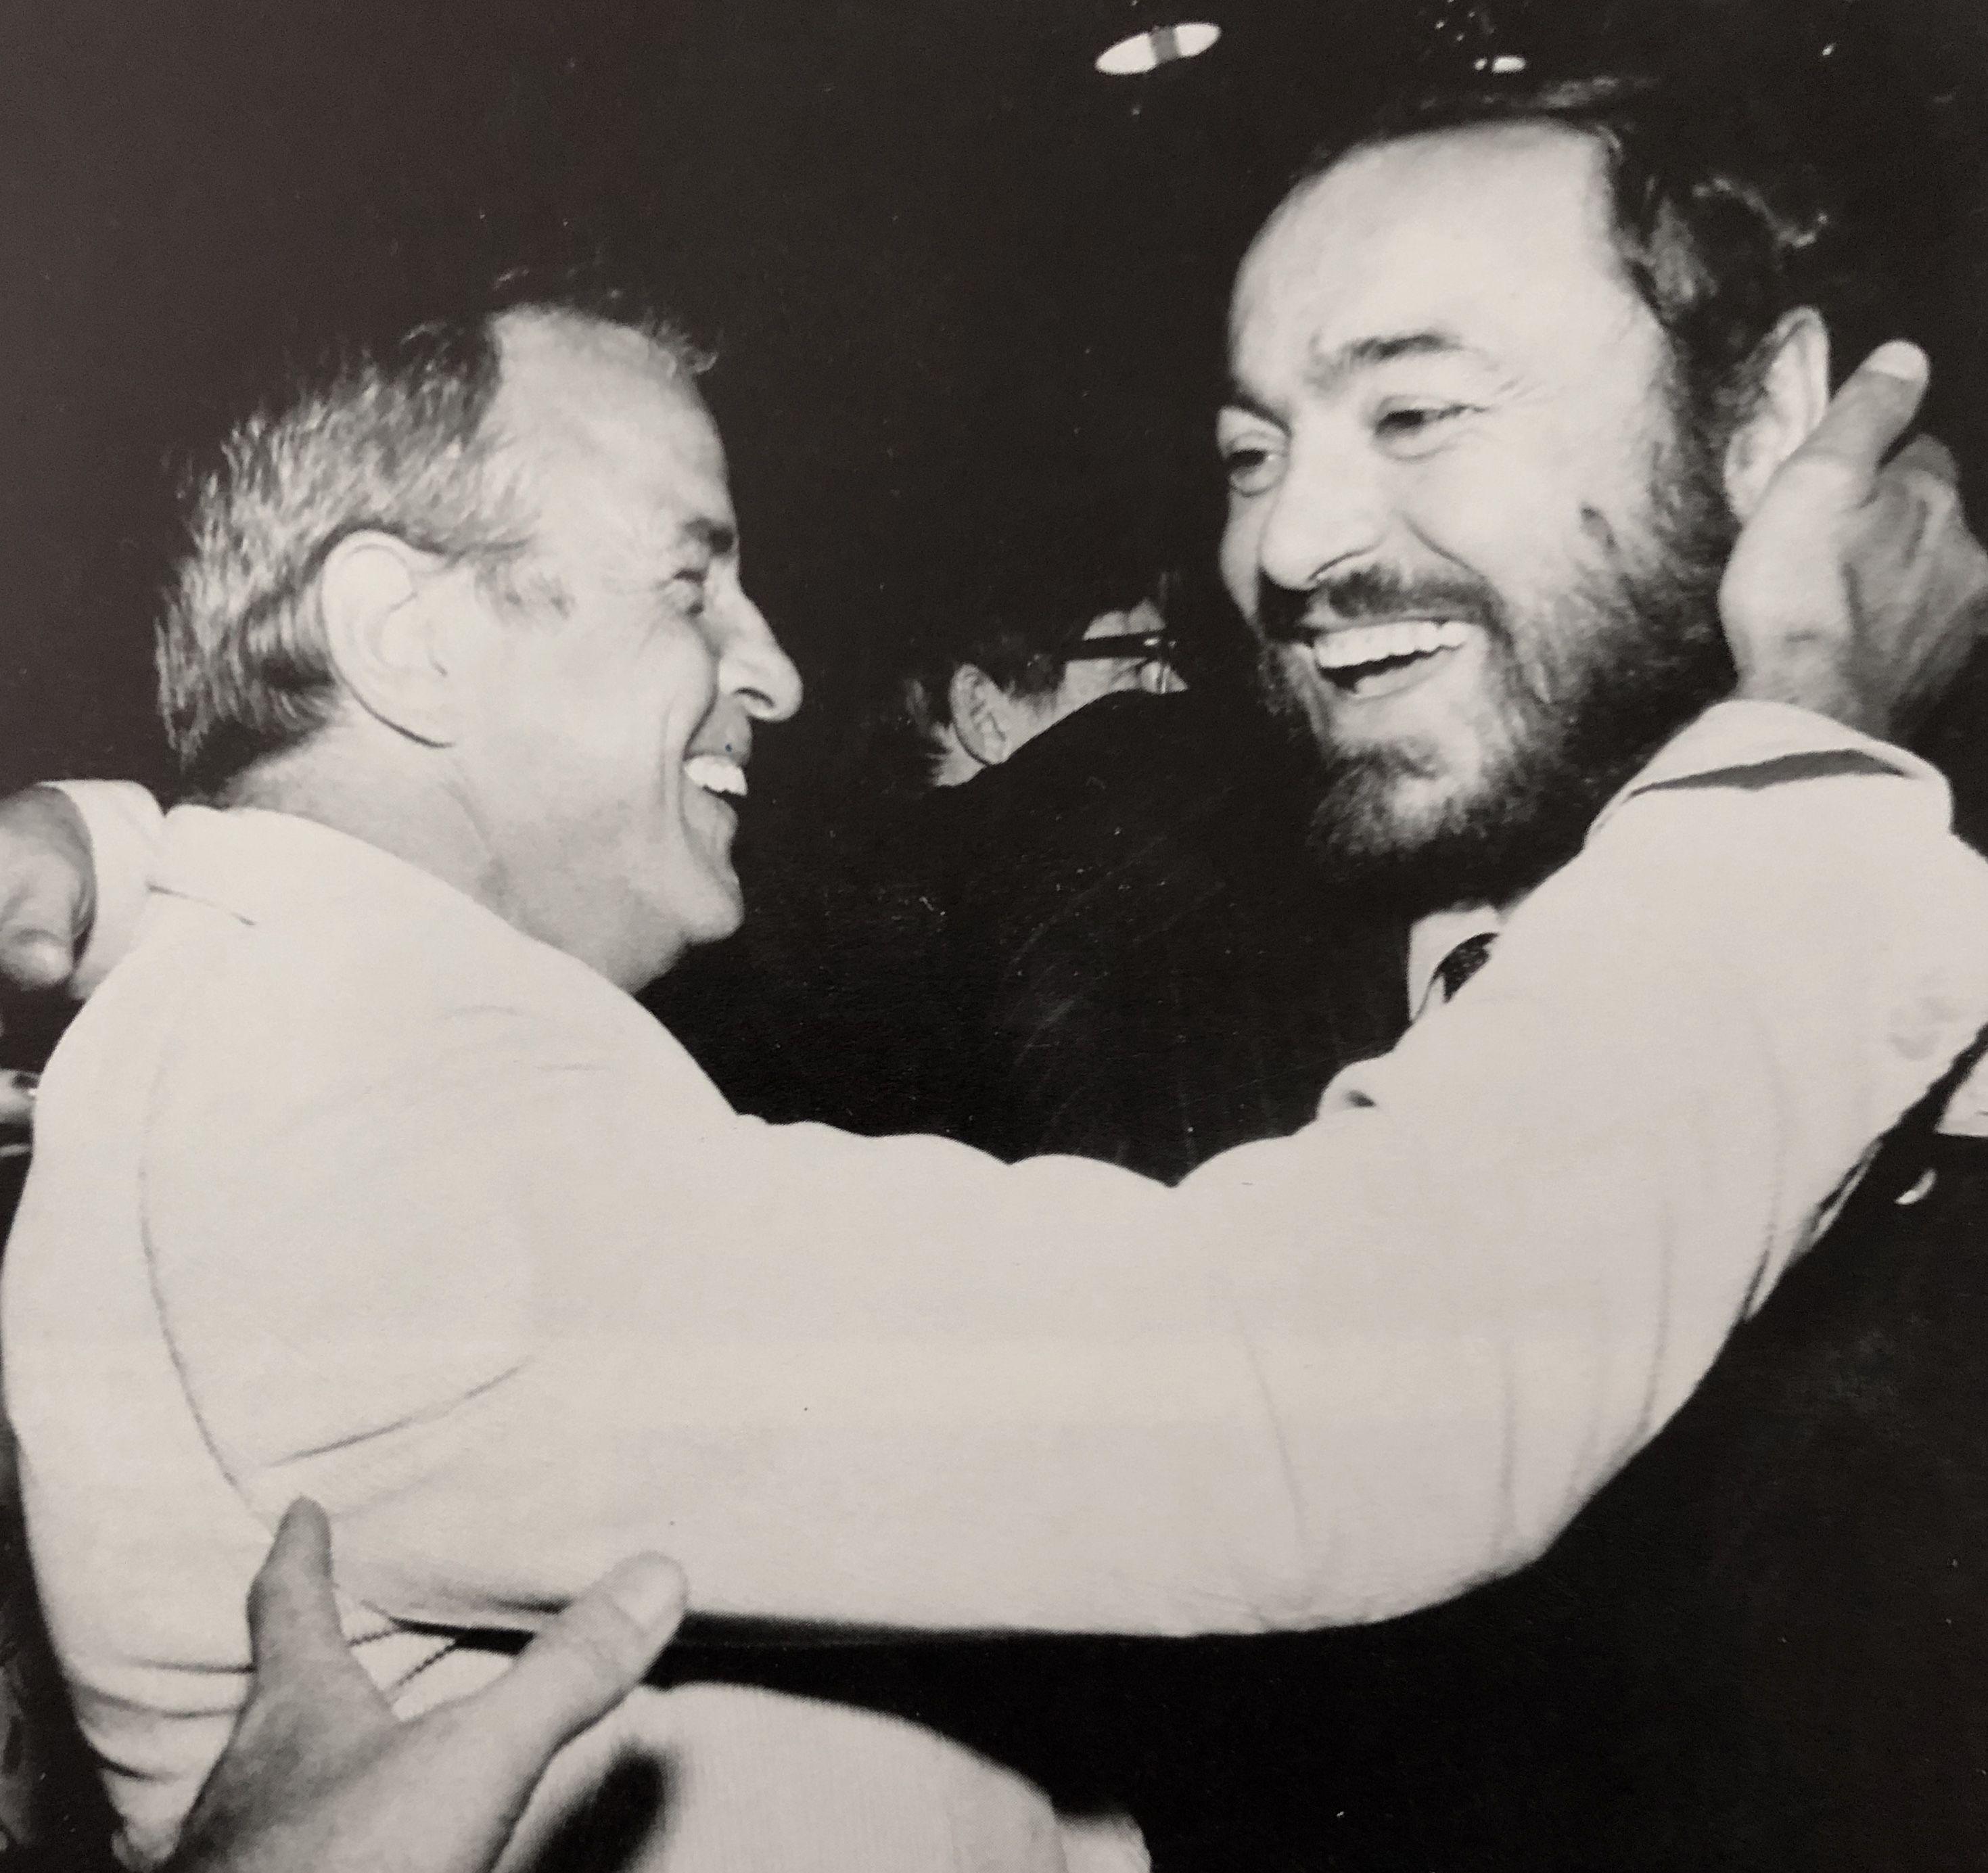 Luciano Pavarotti And Franco Zeffirelli Learn Music Nostalgia Opera